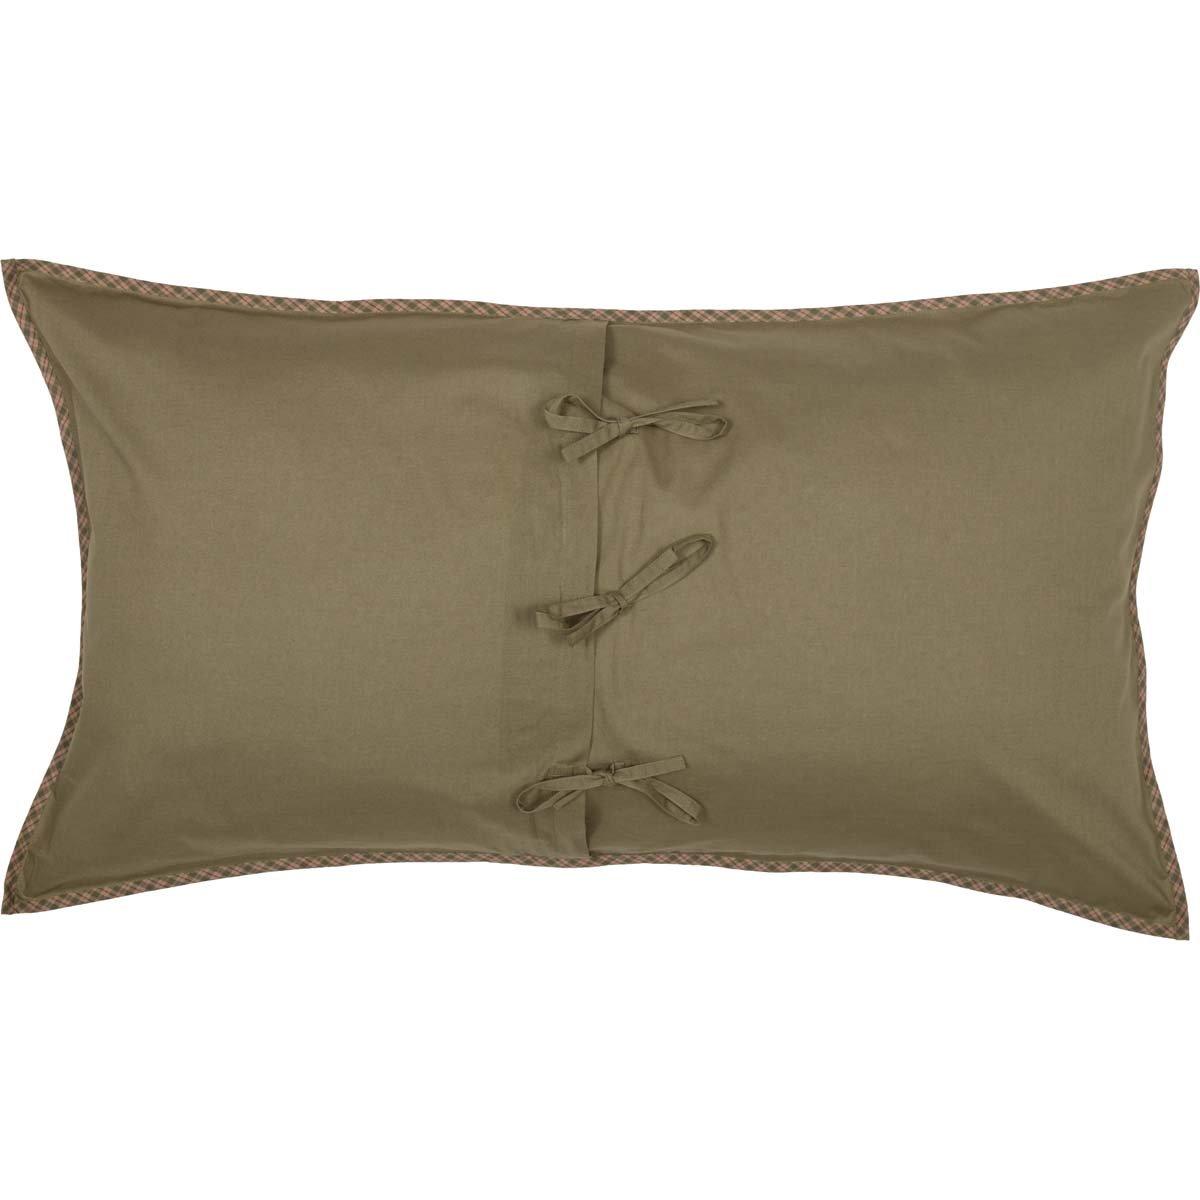 VHC Brands Sequoia Seasonal Bedding Sham Standard Green